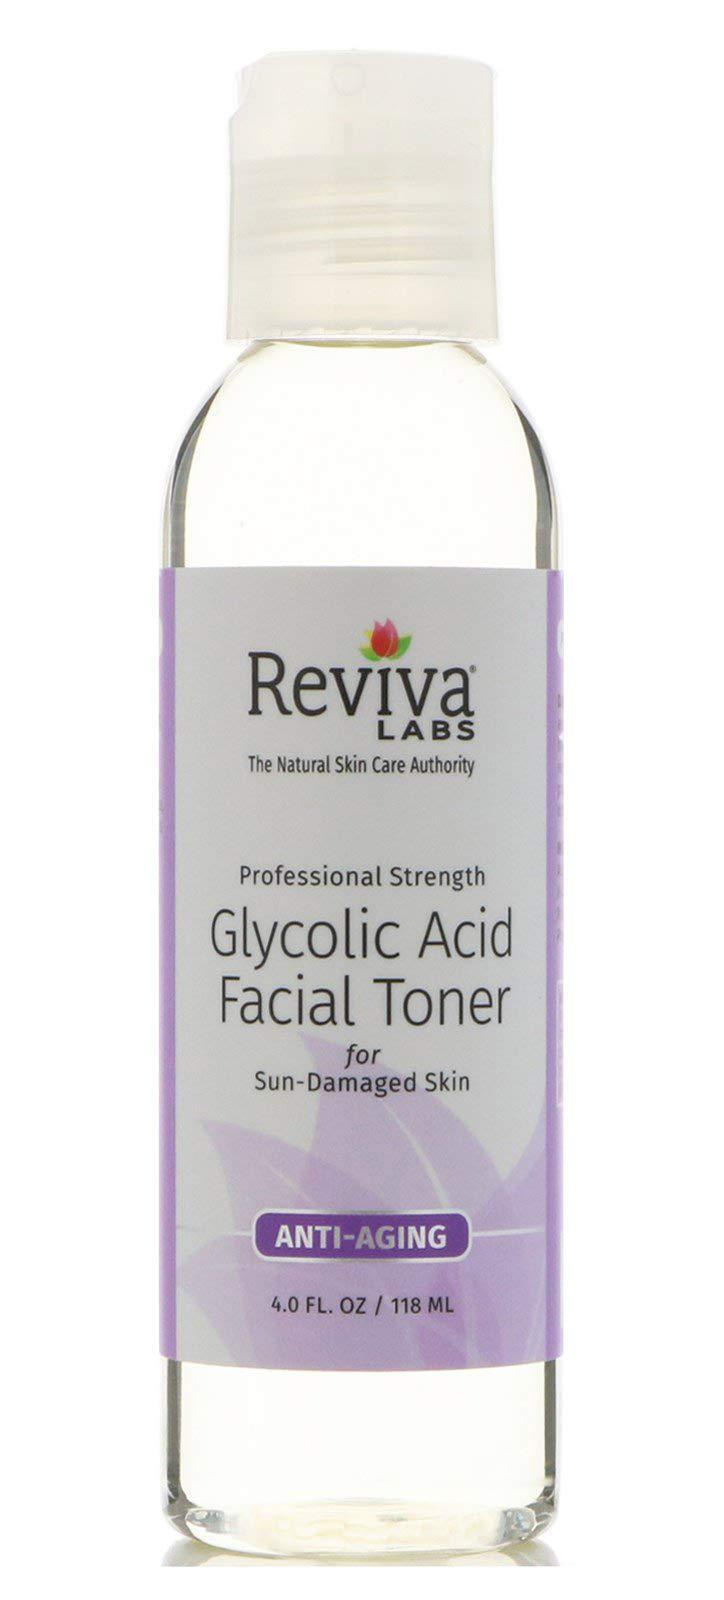 Reviva Labs Glycolic Acid Facial Toner for Sun-Damaged Skin, 4 ounce